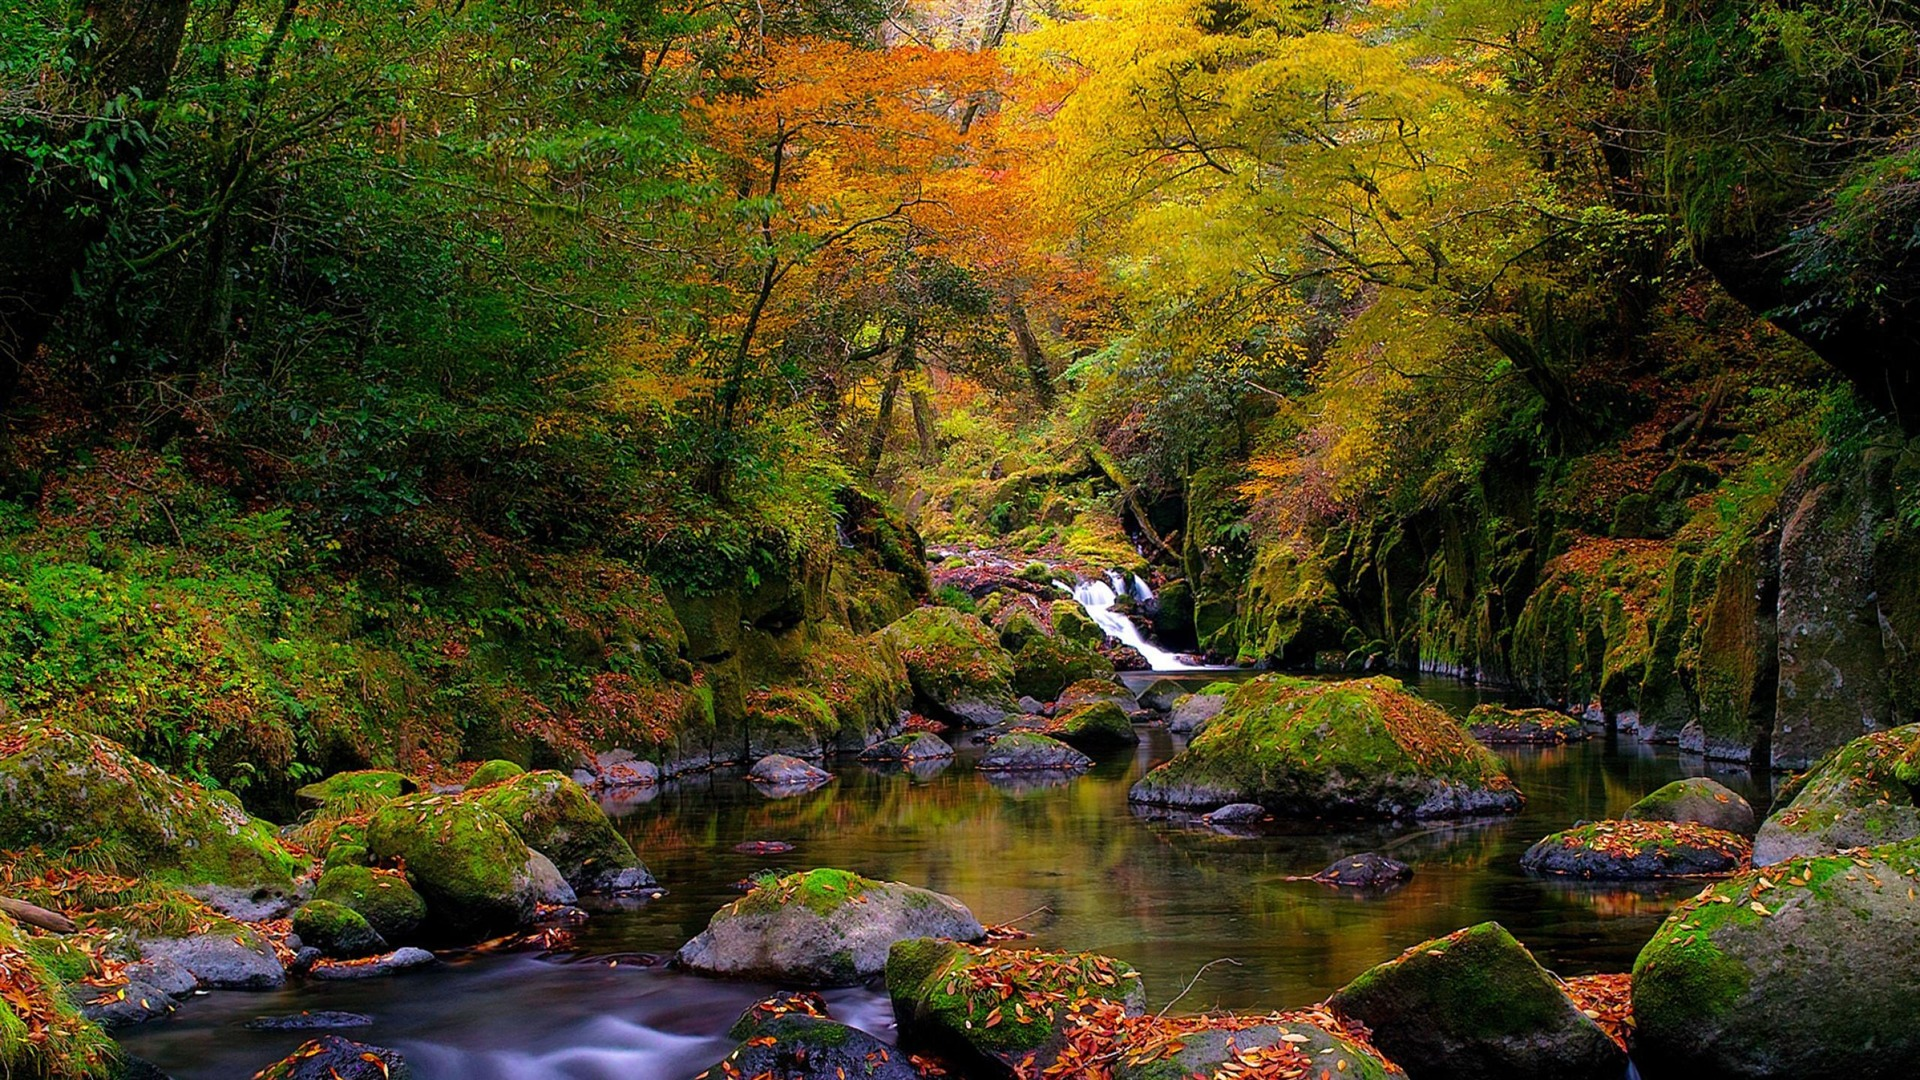 Beautiful Rainy Landscapes Wallpapers Hd 2018 Wallpapertag: 森の小川秋-自然の風景の壁紙プレビュー